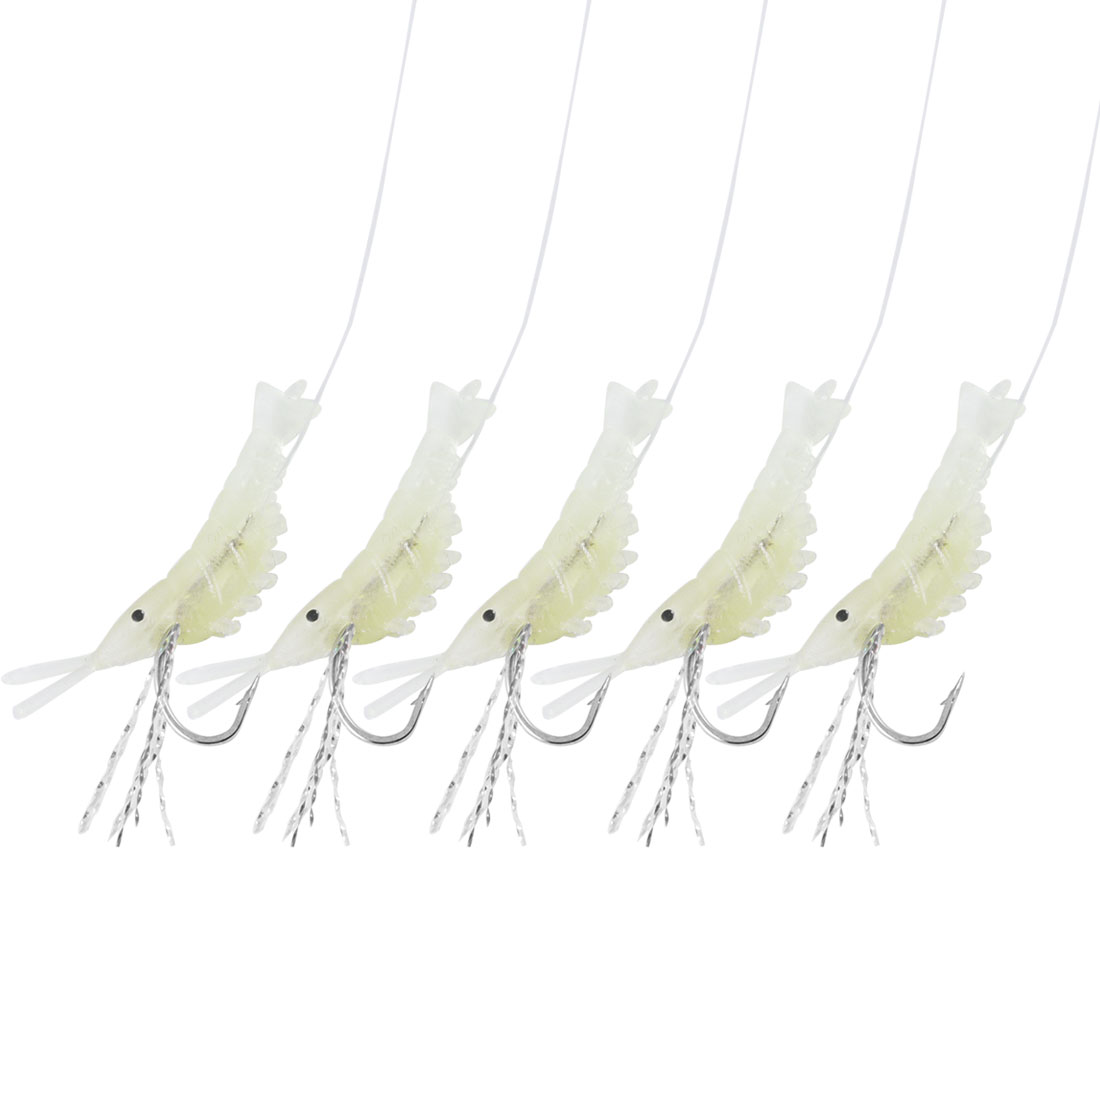 9# Fishing Line 5 in 1 Luminous Silicone Shrimp Bait Fishhooks